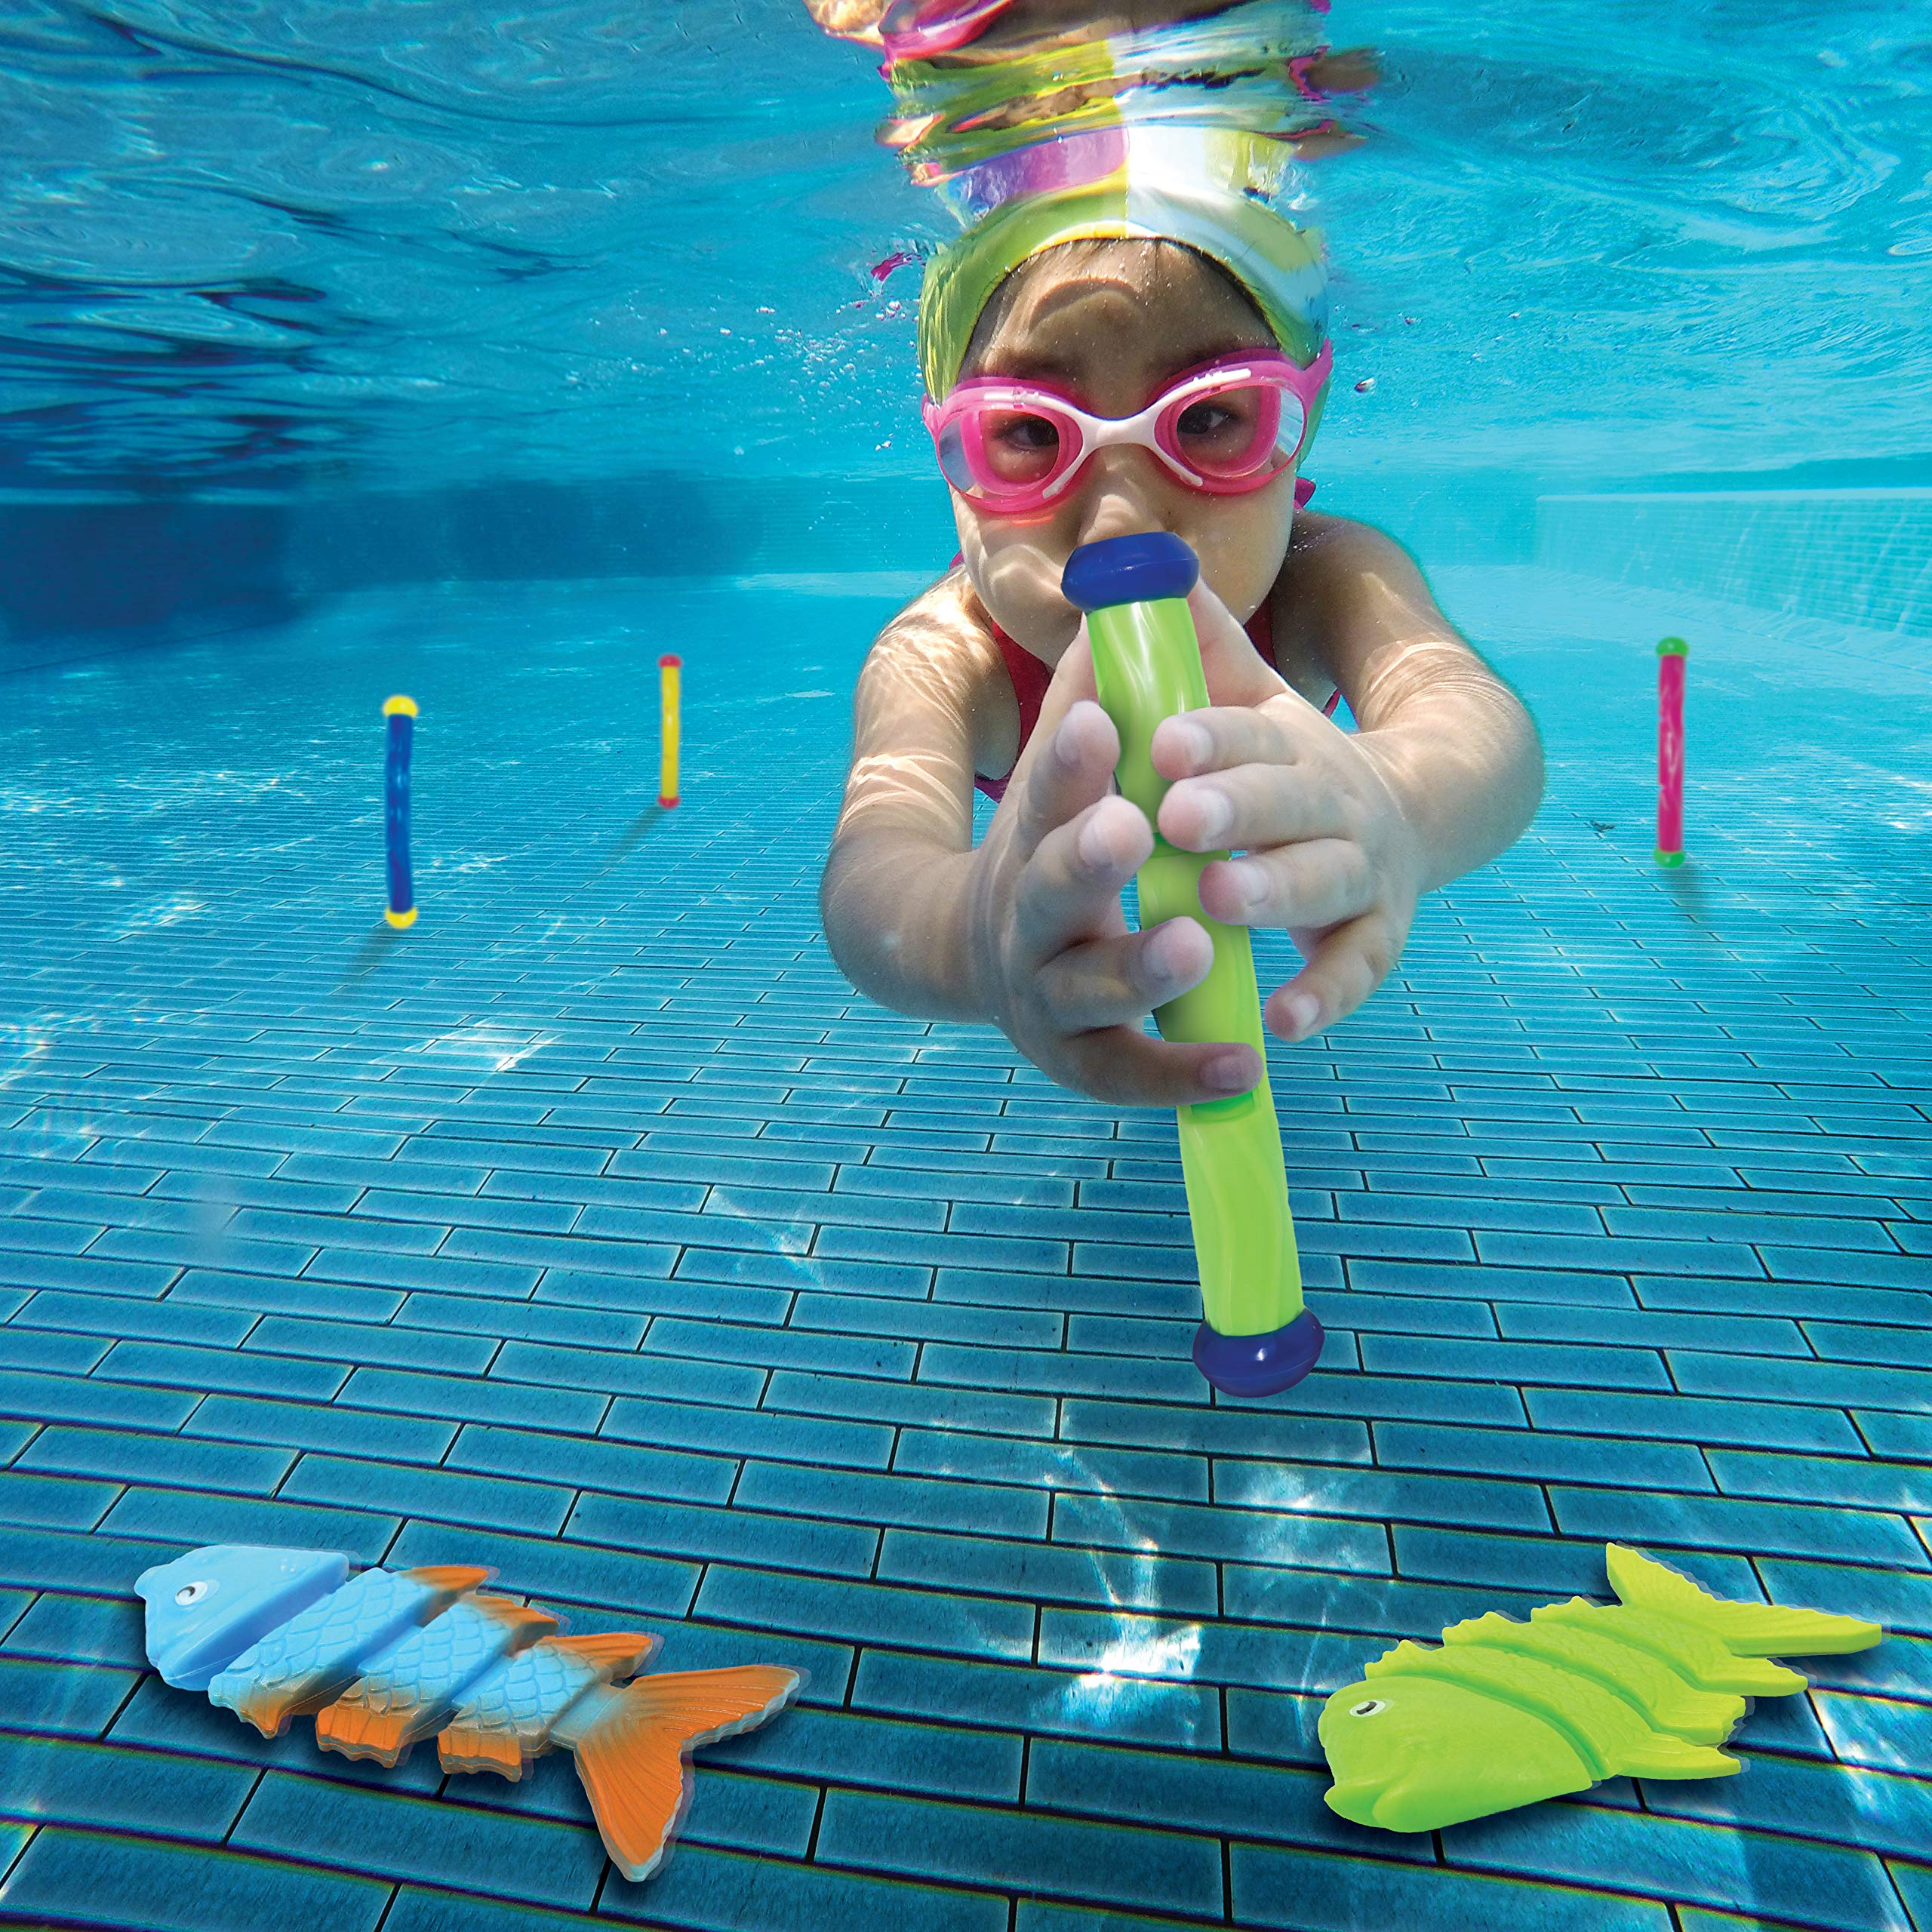 JOYIN 30 Pcs Diving Pool Toys Jumbo Set Includes (5) Diving Sticks, (6) Diving Rings, (5) Pirate Treasures, (4) Toypedo Bandits, (3) Diving Toy Balls, (3) Fish Toys, (4) Stringy Octopus by JOYIN (Image #3)